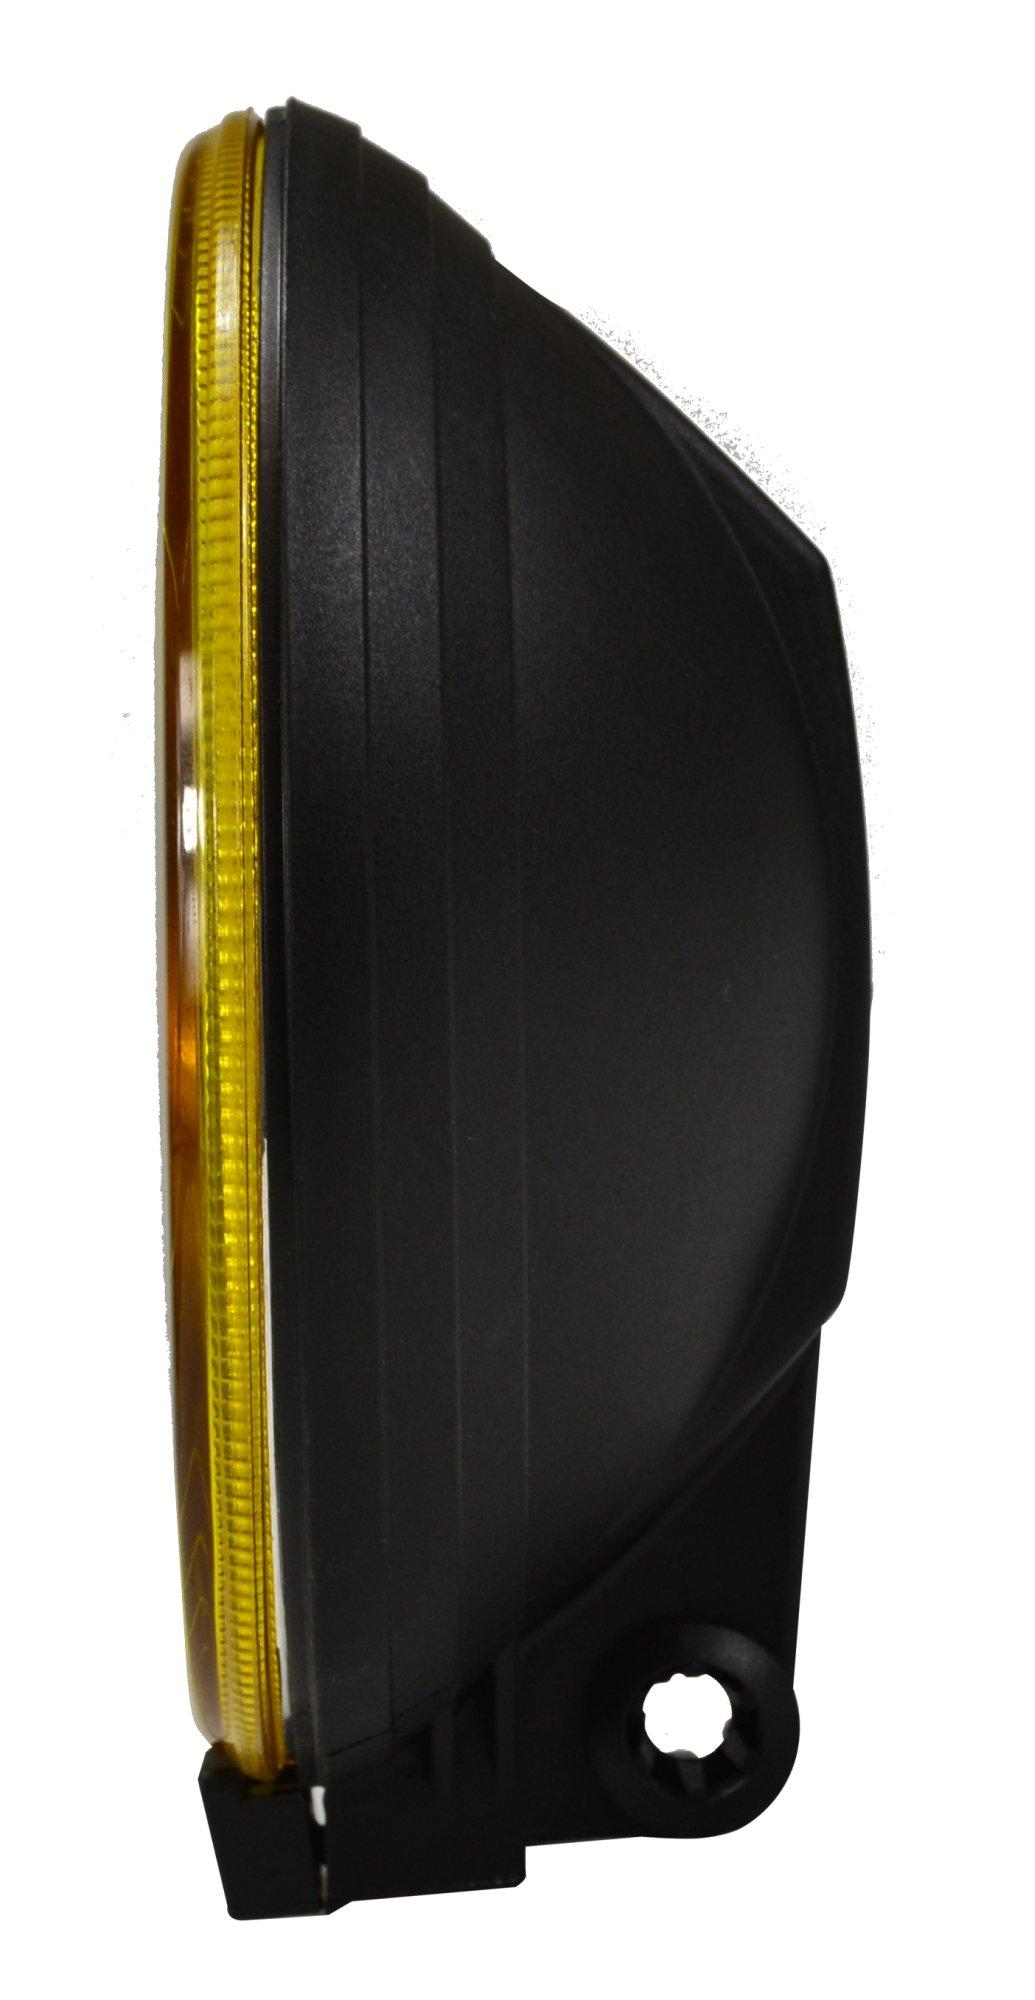 HELLA 005750512 500 Series Amber Driving Lamp (Single) by HELLA (Image #5)